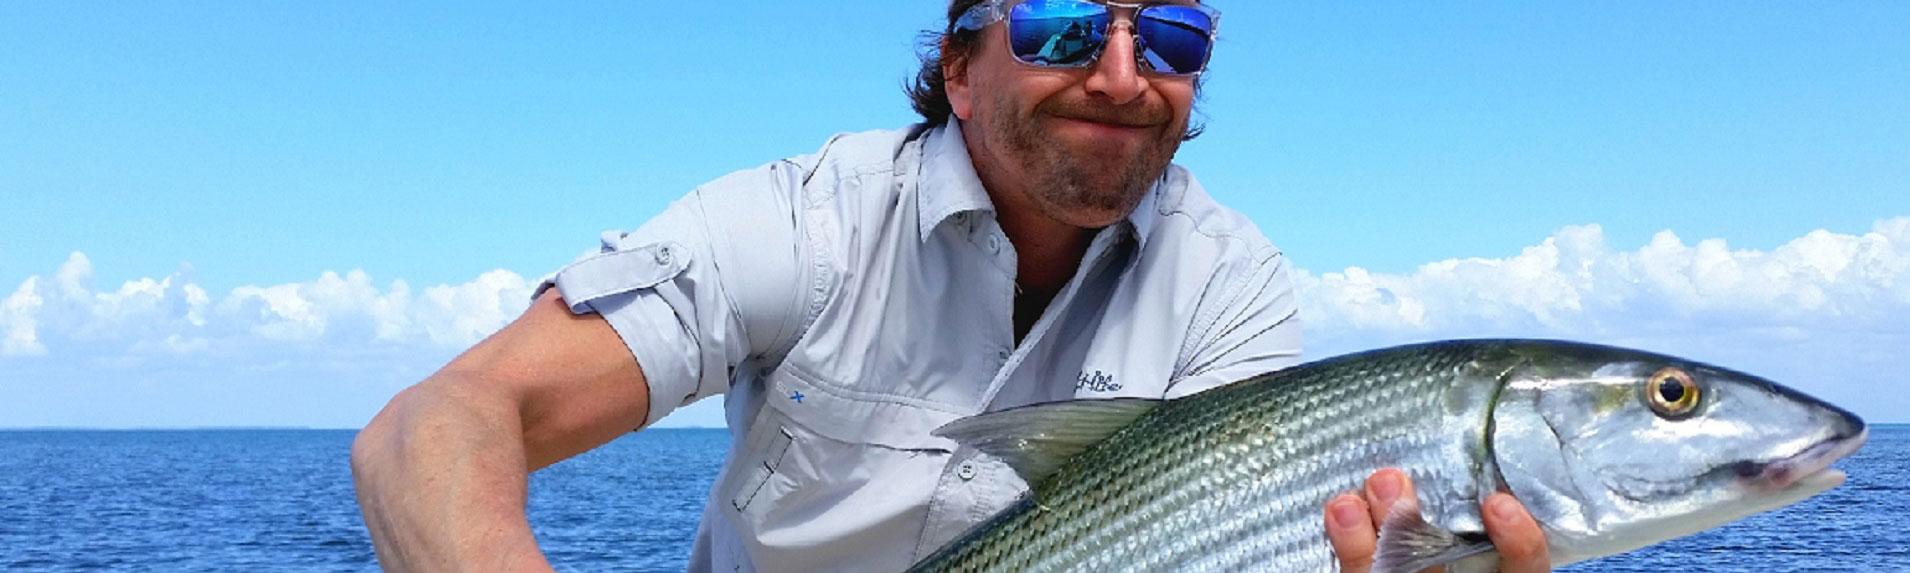 Miami fishing guide miami tarpon fishing miami inshore for My fishing advisor